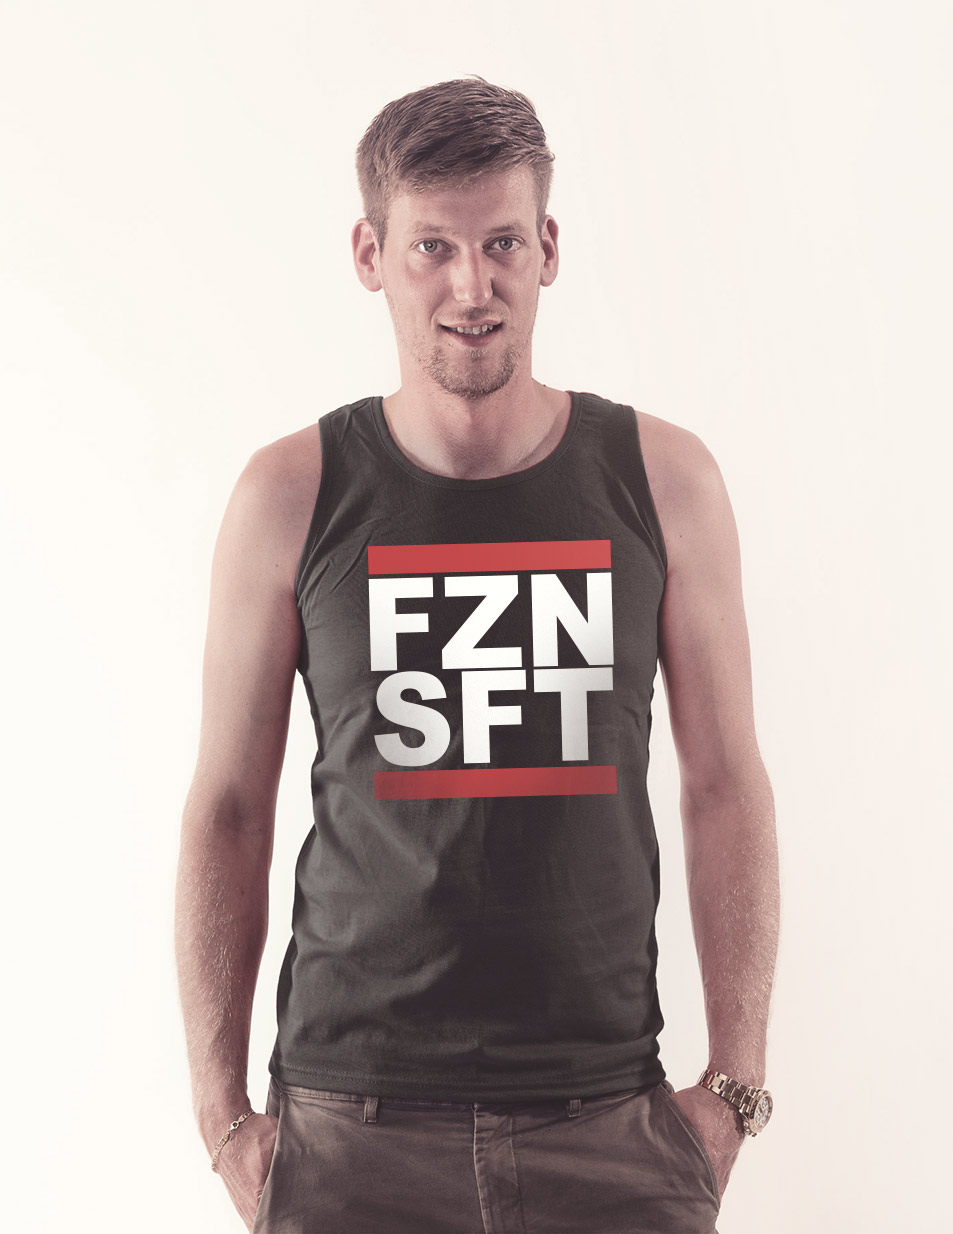 FZNSFT Tank Top mehrfarbig auf schwarz